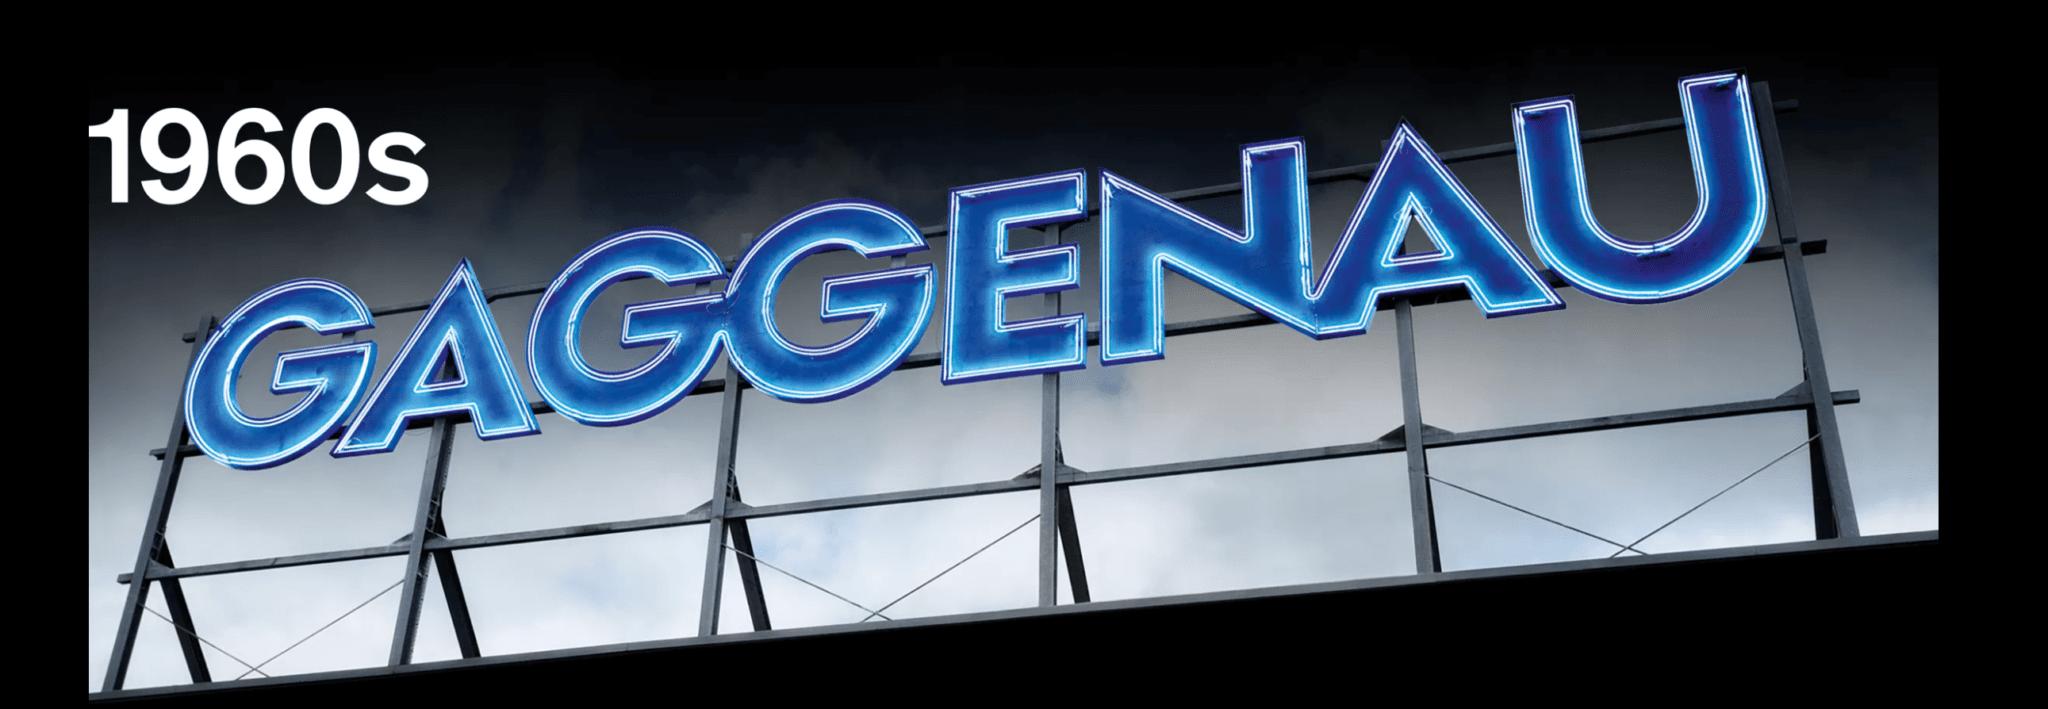 Gaggenau 2021-01-03 at 12.26.17 PM